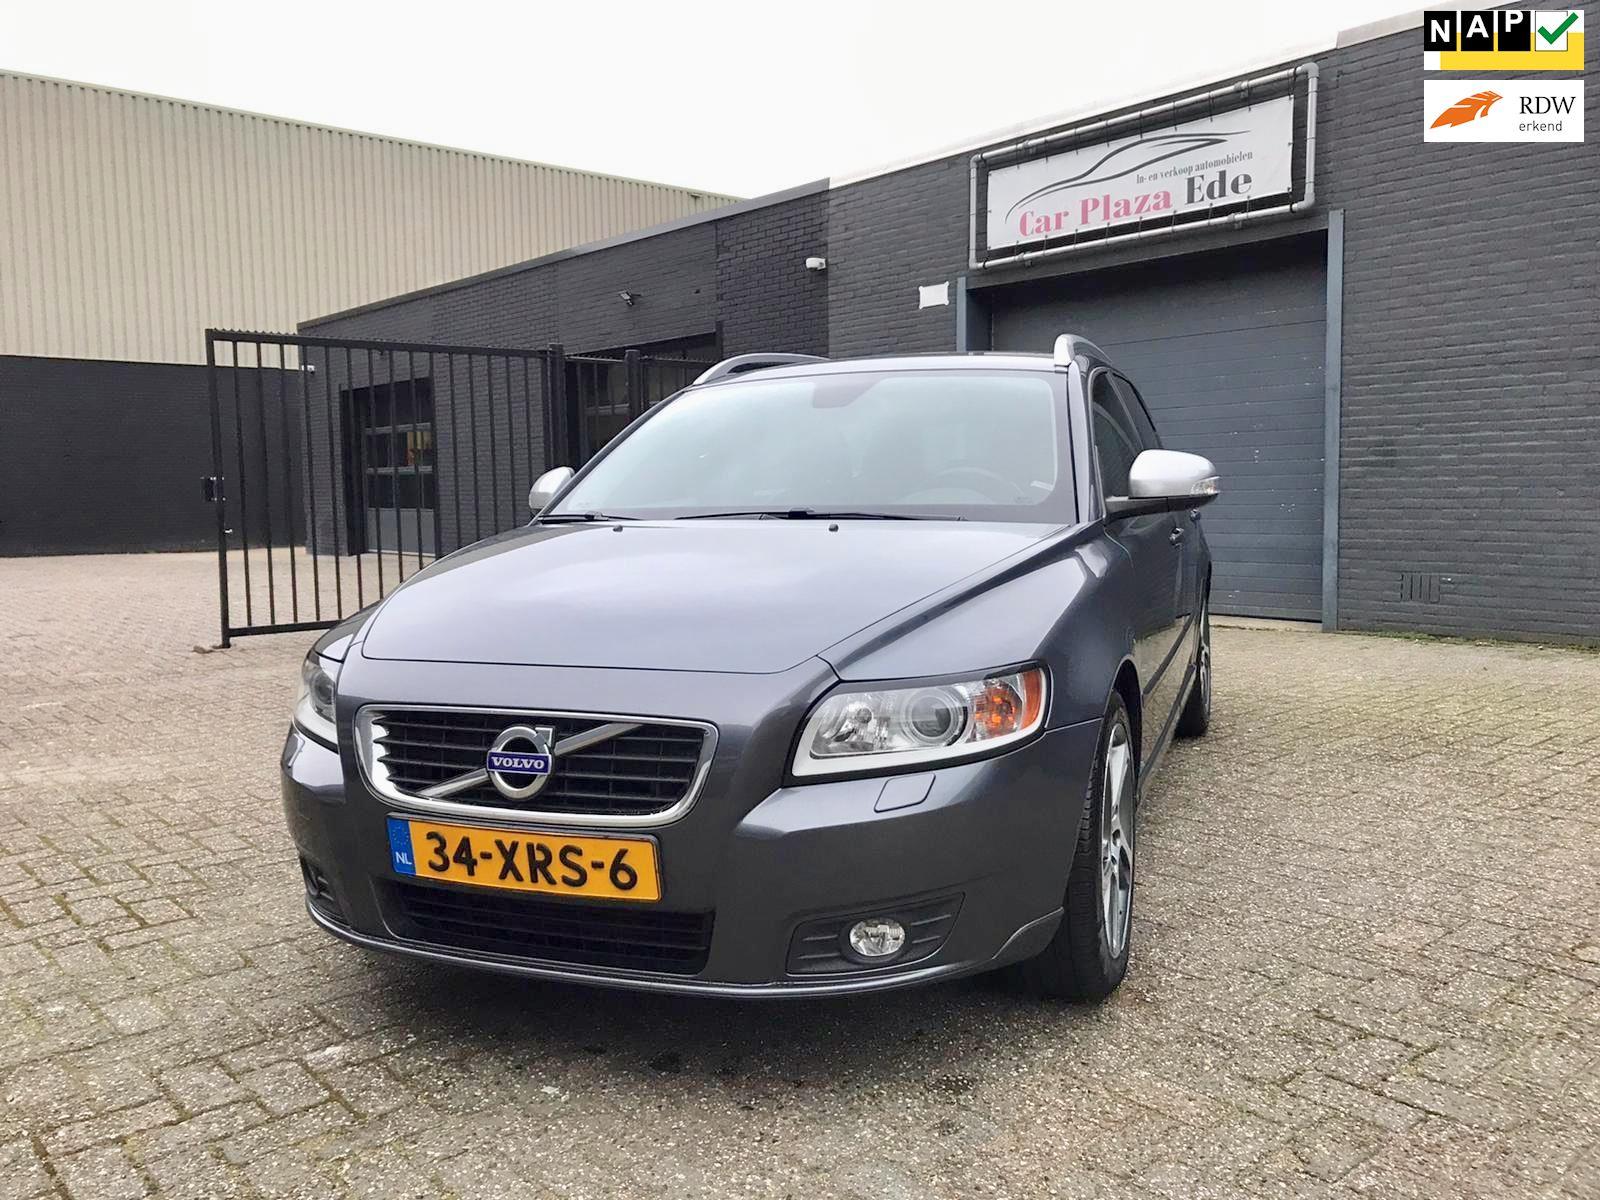 Volvo V50 occasion - Carplaza Ede